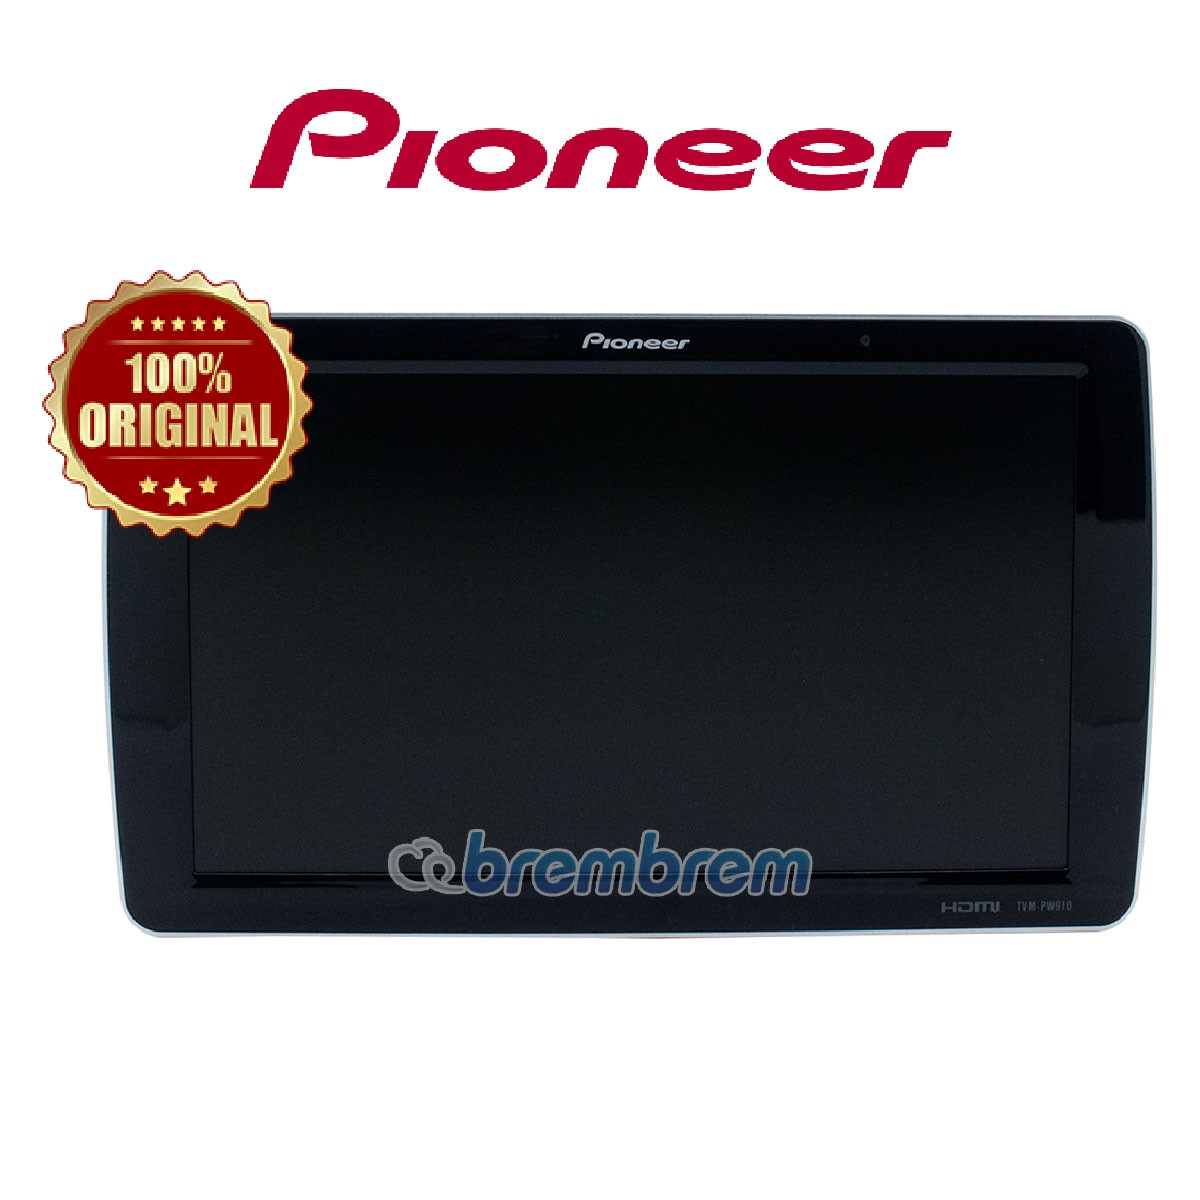 PIONEER TVM-PW910T - HEADREST MONITOR